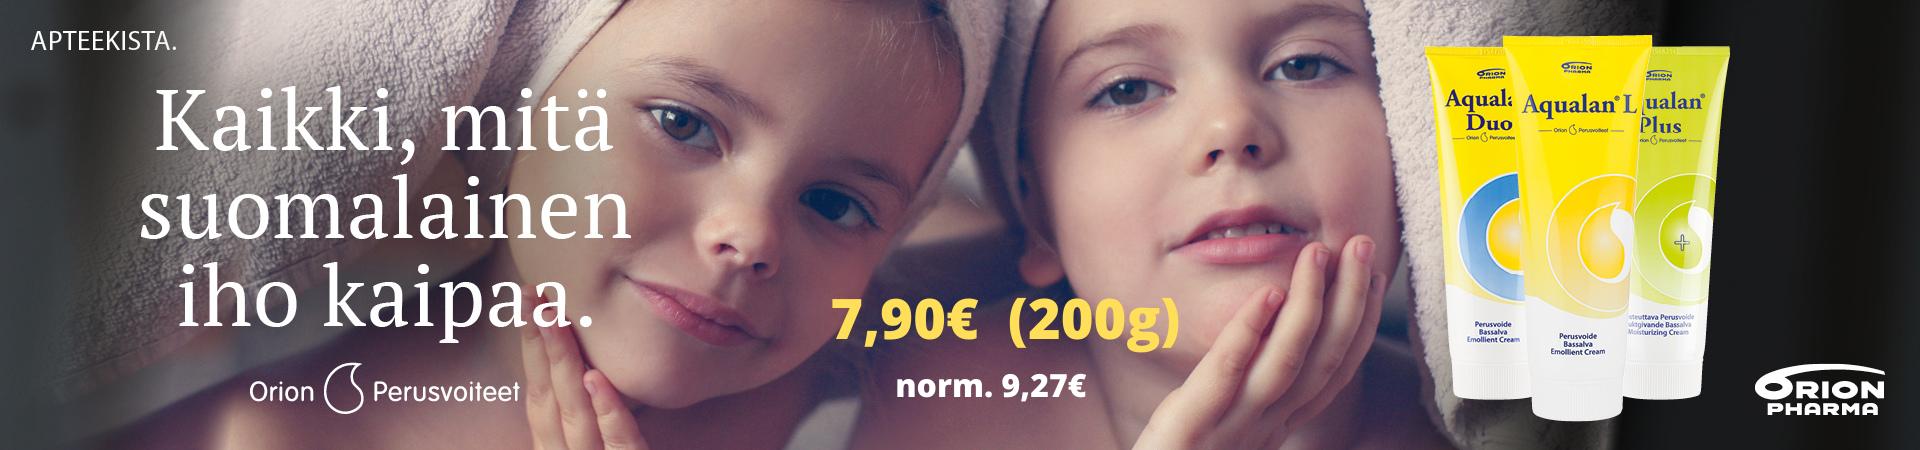 Aqualan L, Aqualan Duo, Aqualan Plus 200g joulukuun tarjous 7,90€